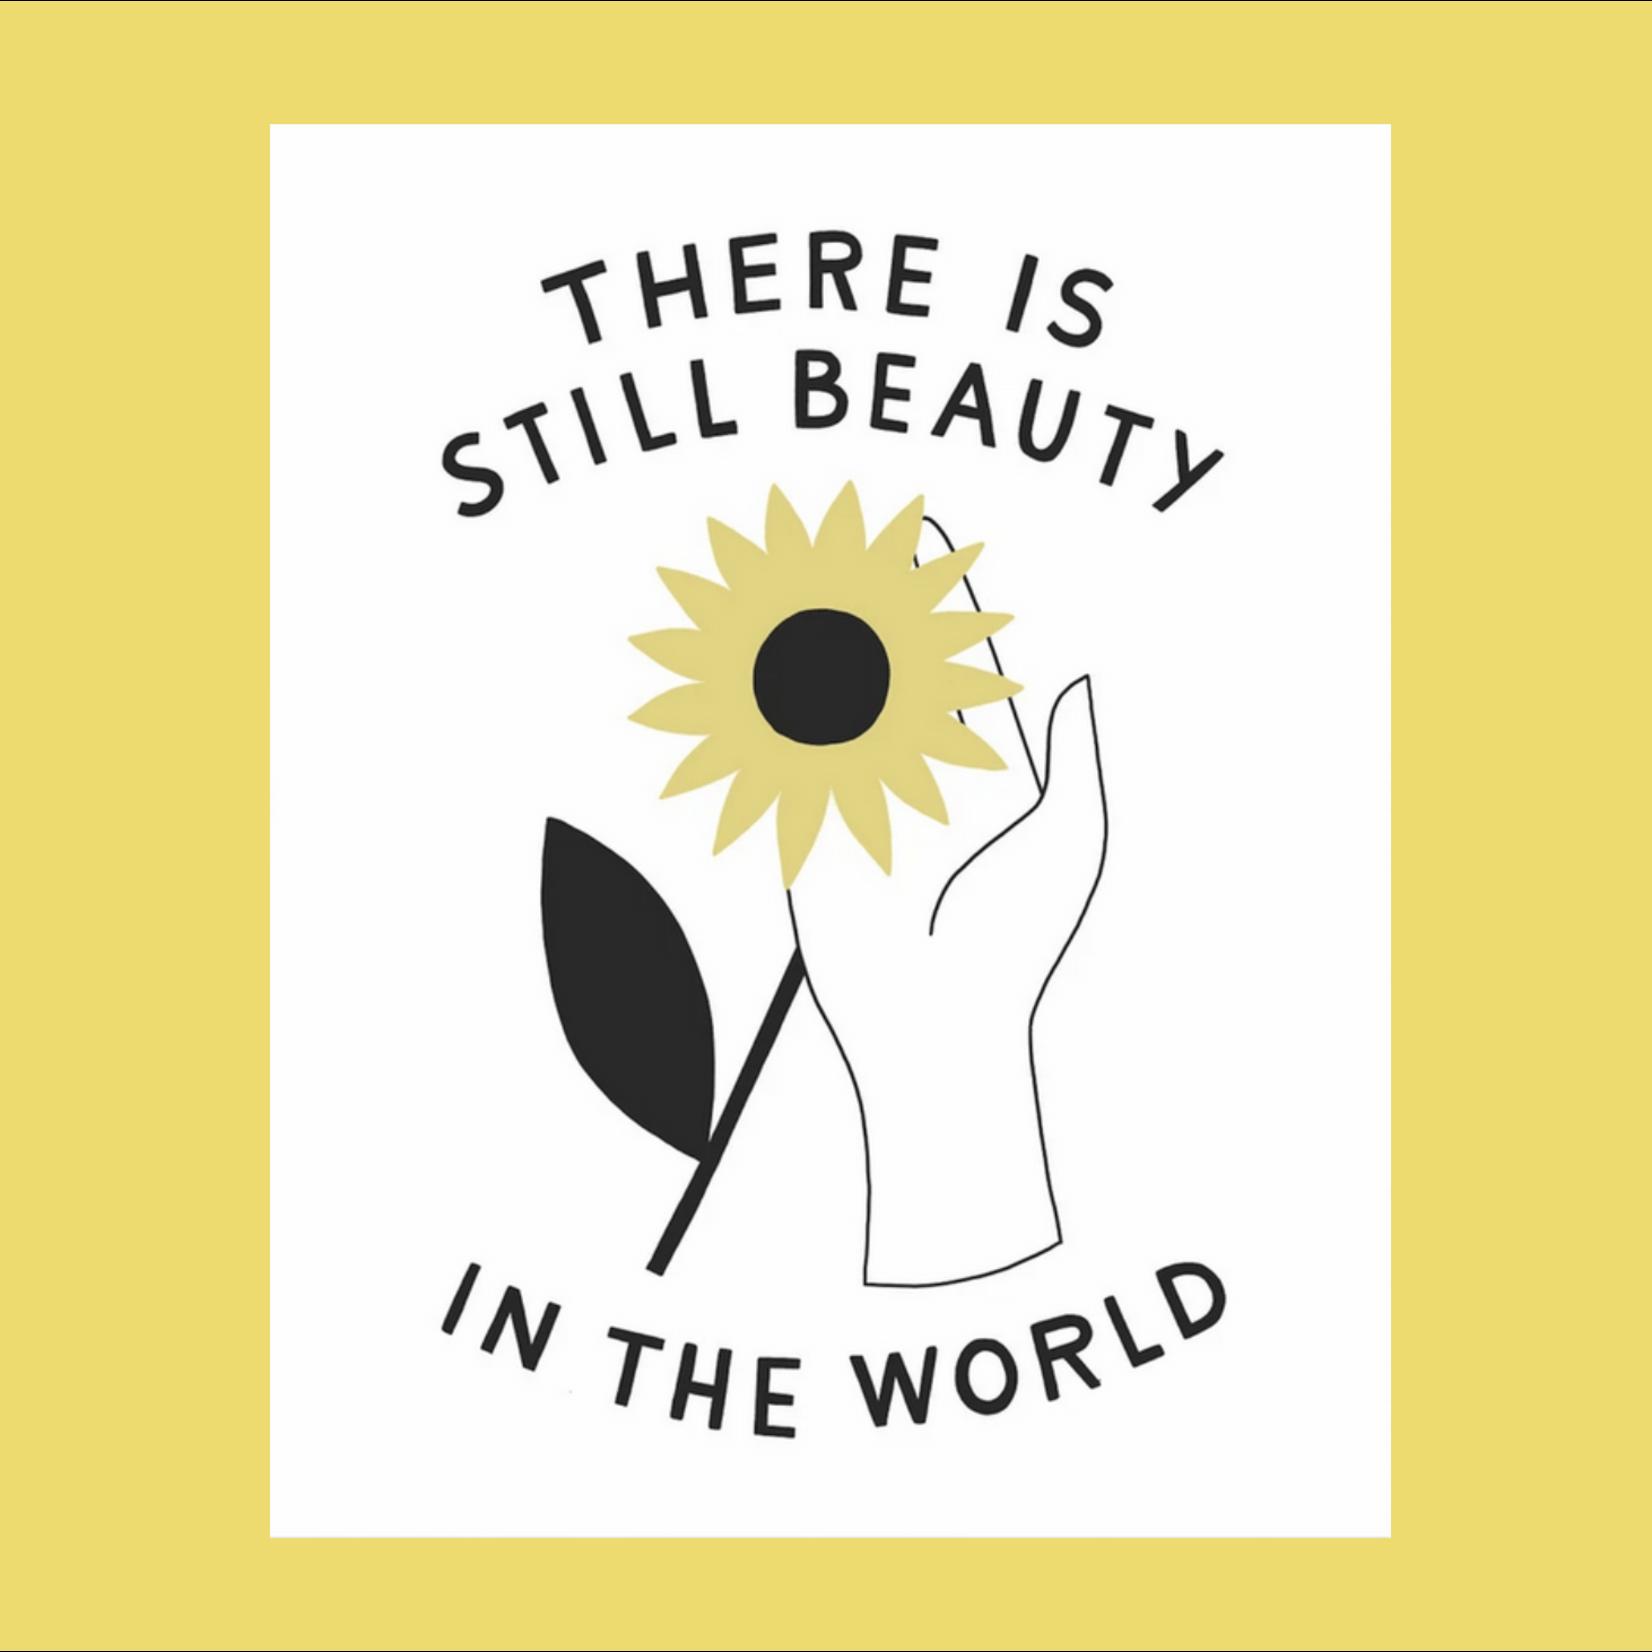 Worthwhile Paper Still Beauty In The World Sunflower 11x14 Art Print